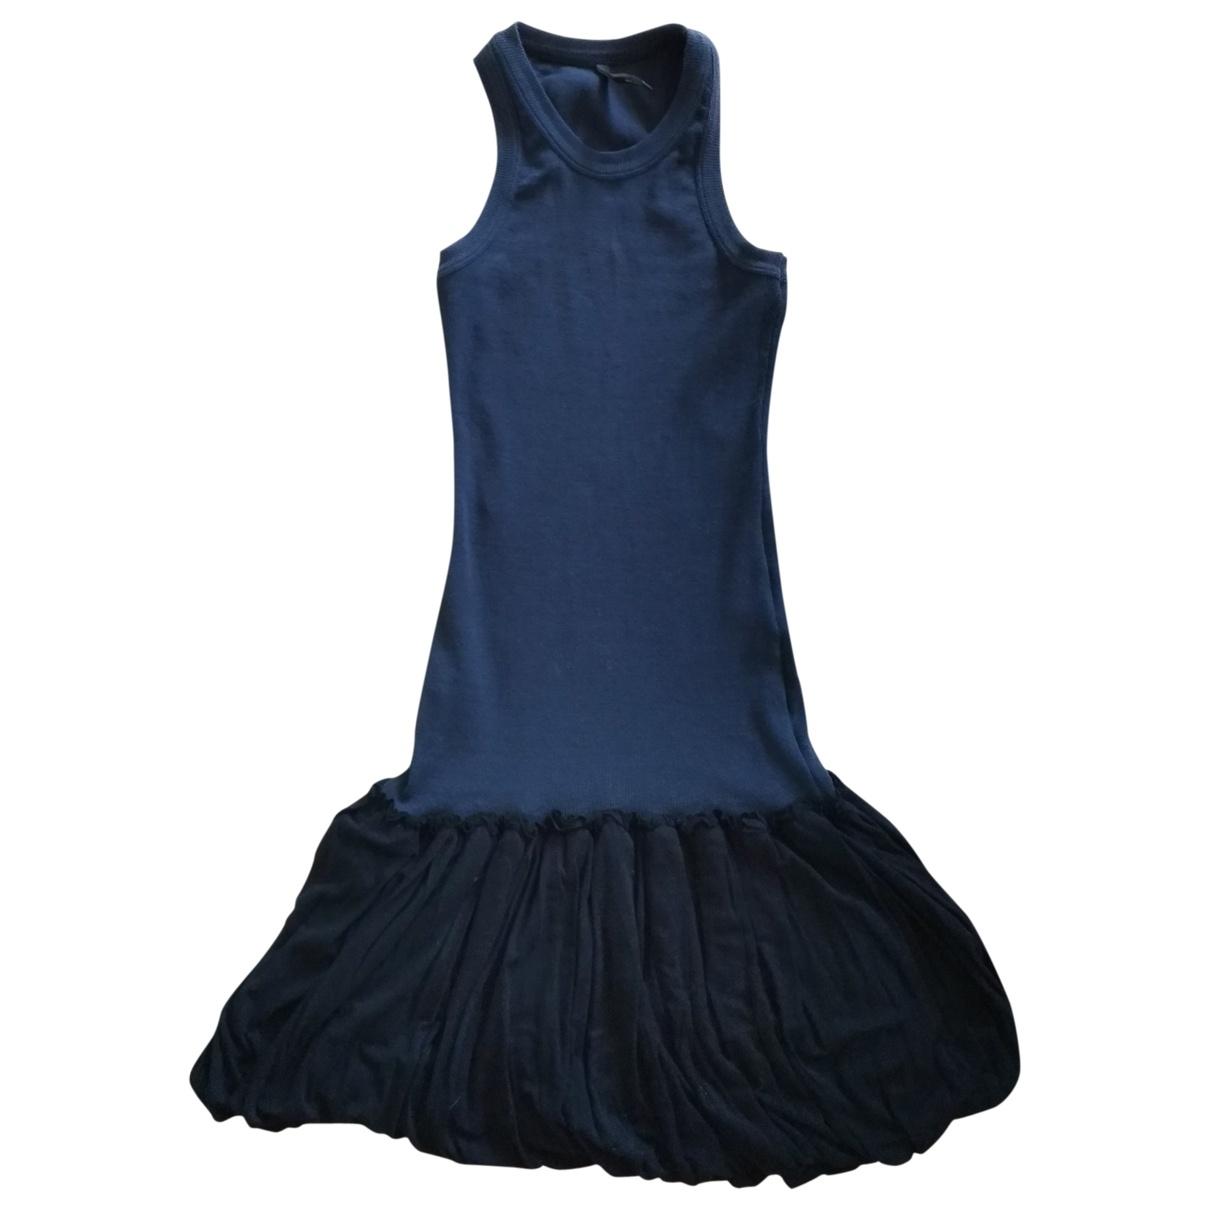 Absolu \N Black Cotton - elasthane dress for Women 42 IT